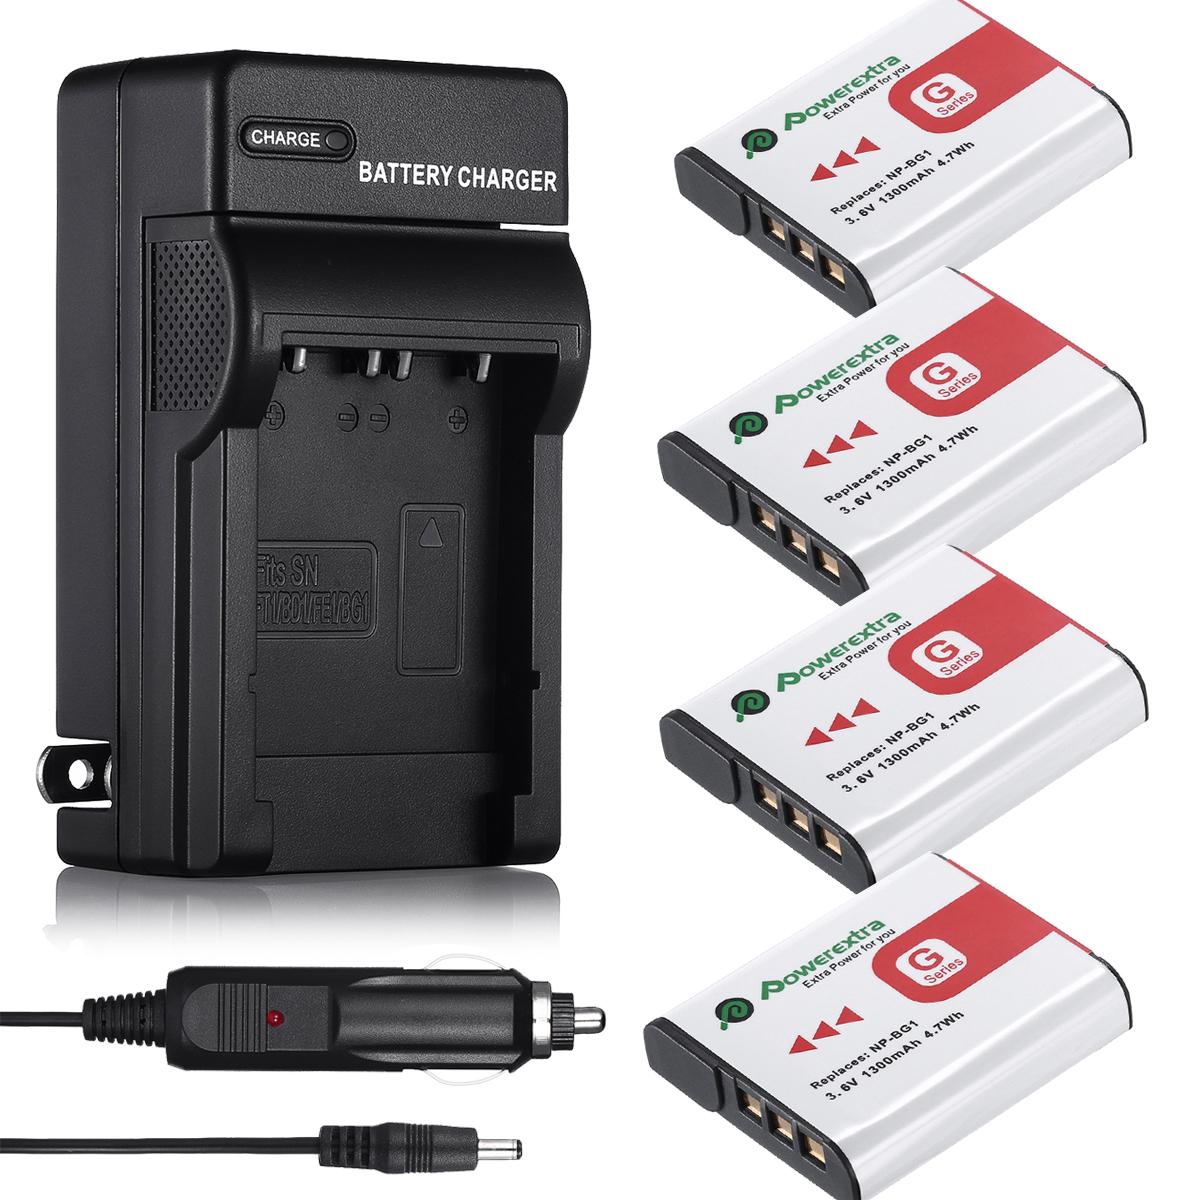 Type G Battery For Sony Cybershot Np Bg1 Fg1 Dsc H20 H9 H3